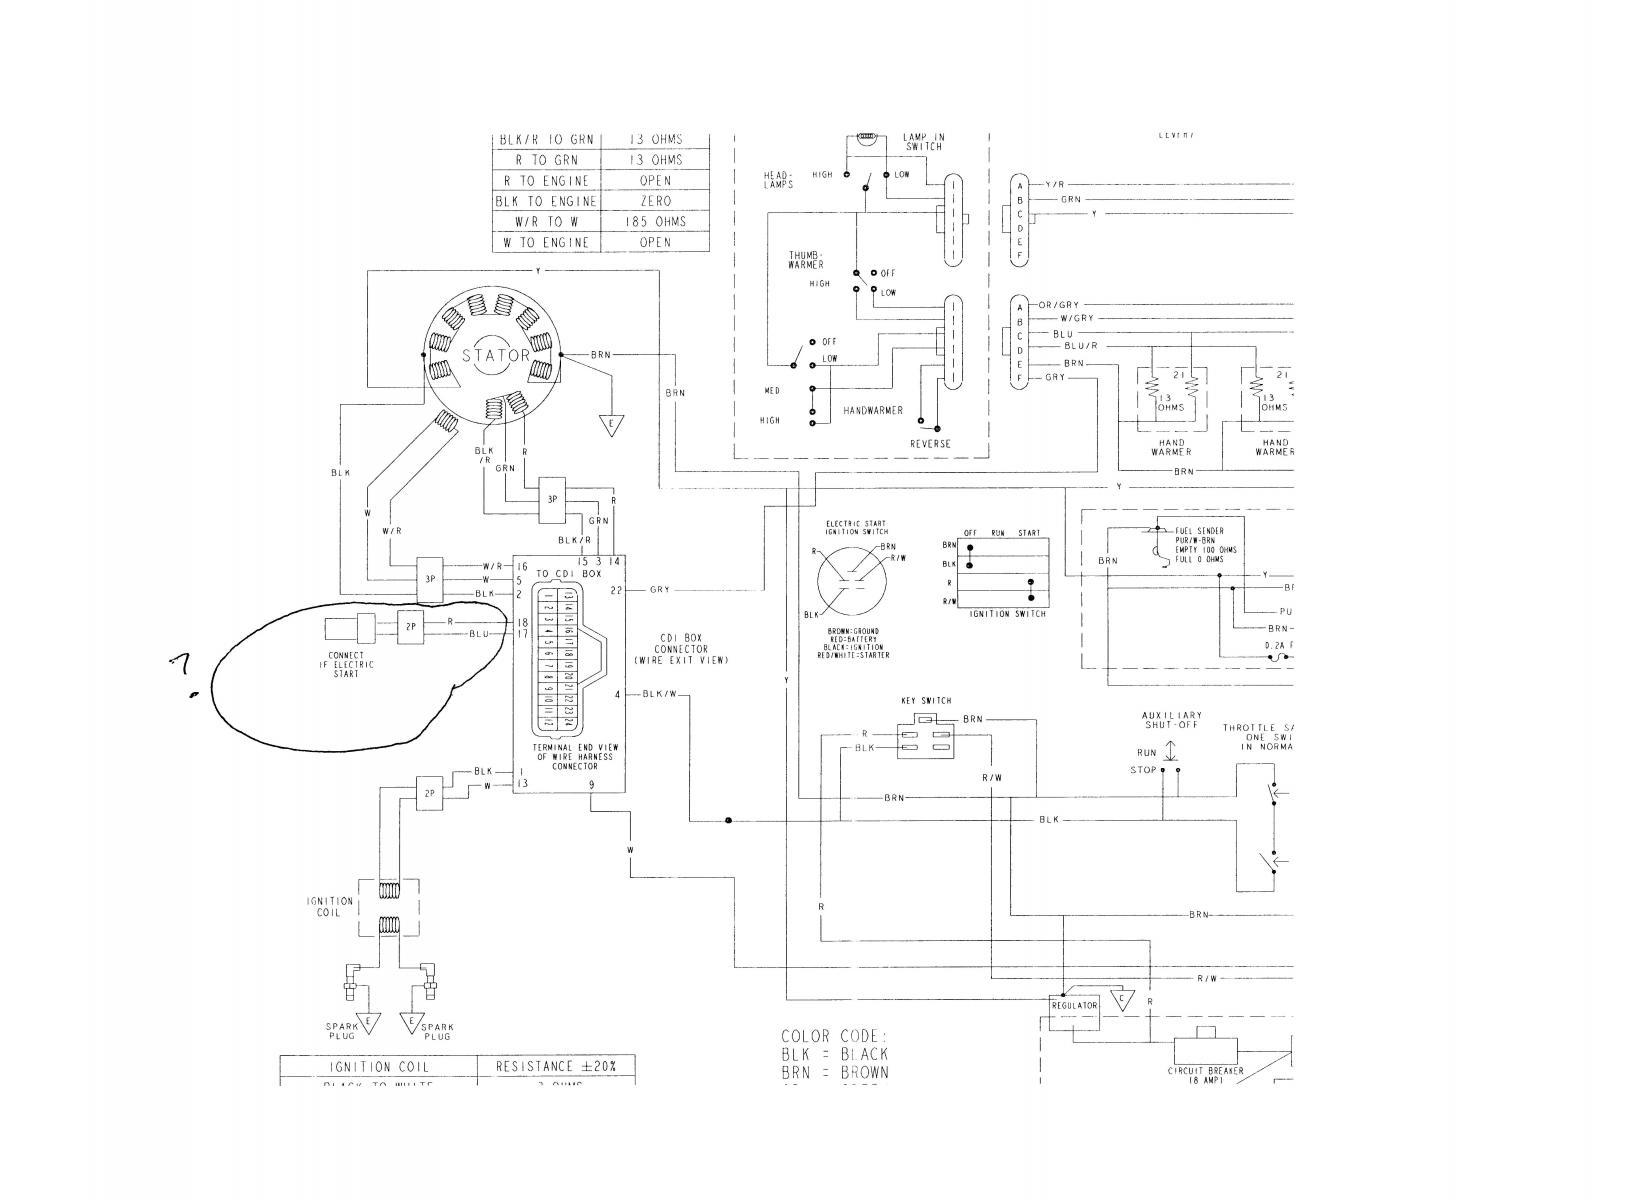 Polaris Xc Wiring Diagram Overhead Door Control Wiring Schematic Bege Wiring Diagram